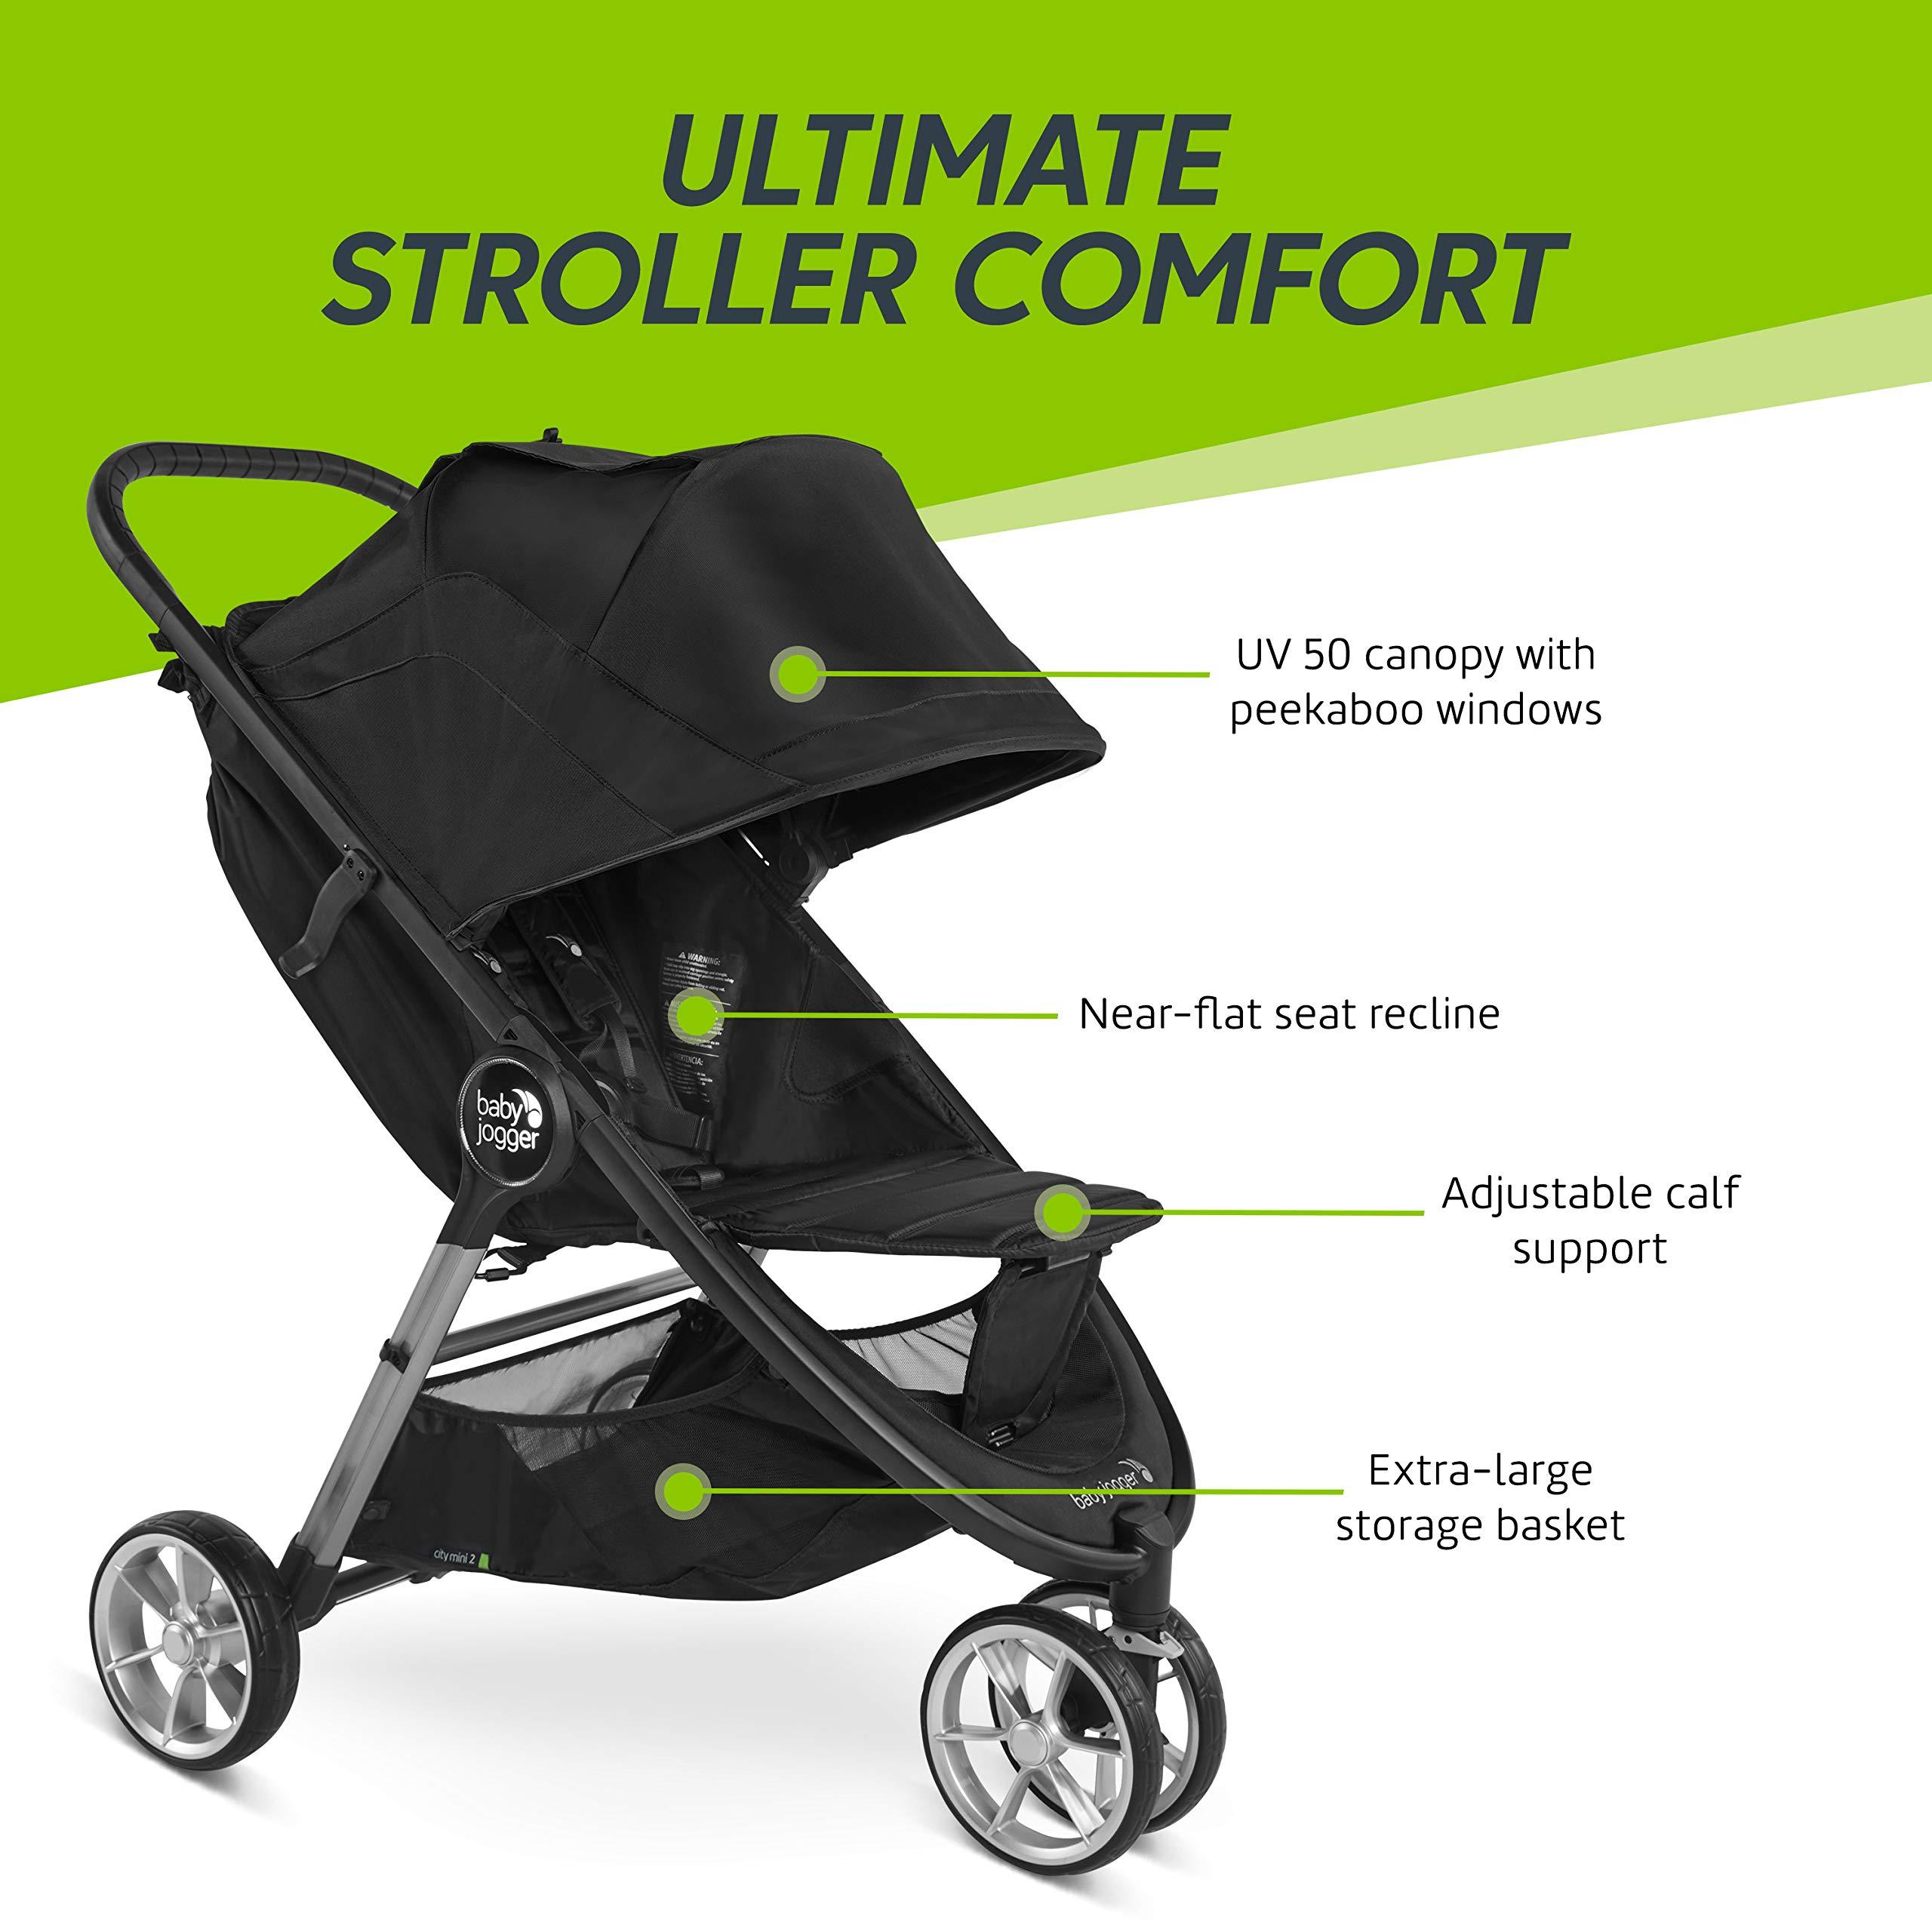 Baby Jogger City Mini 2 Stroller - 2019   Compact, Lightweight Stroller   Quick Fold Baby Stroller, Carbon by Baby Jogger (Image #7)